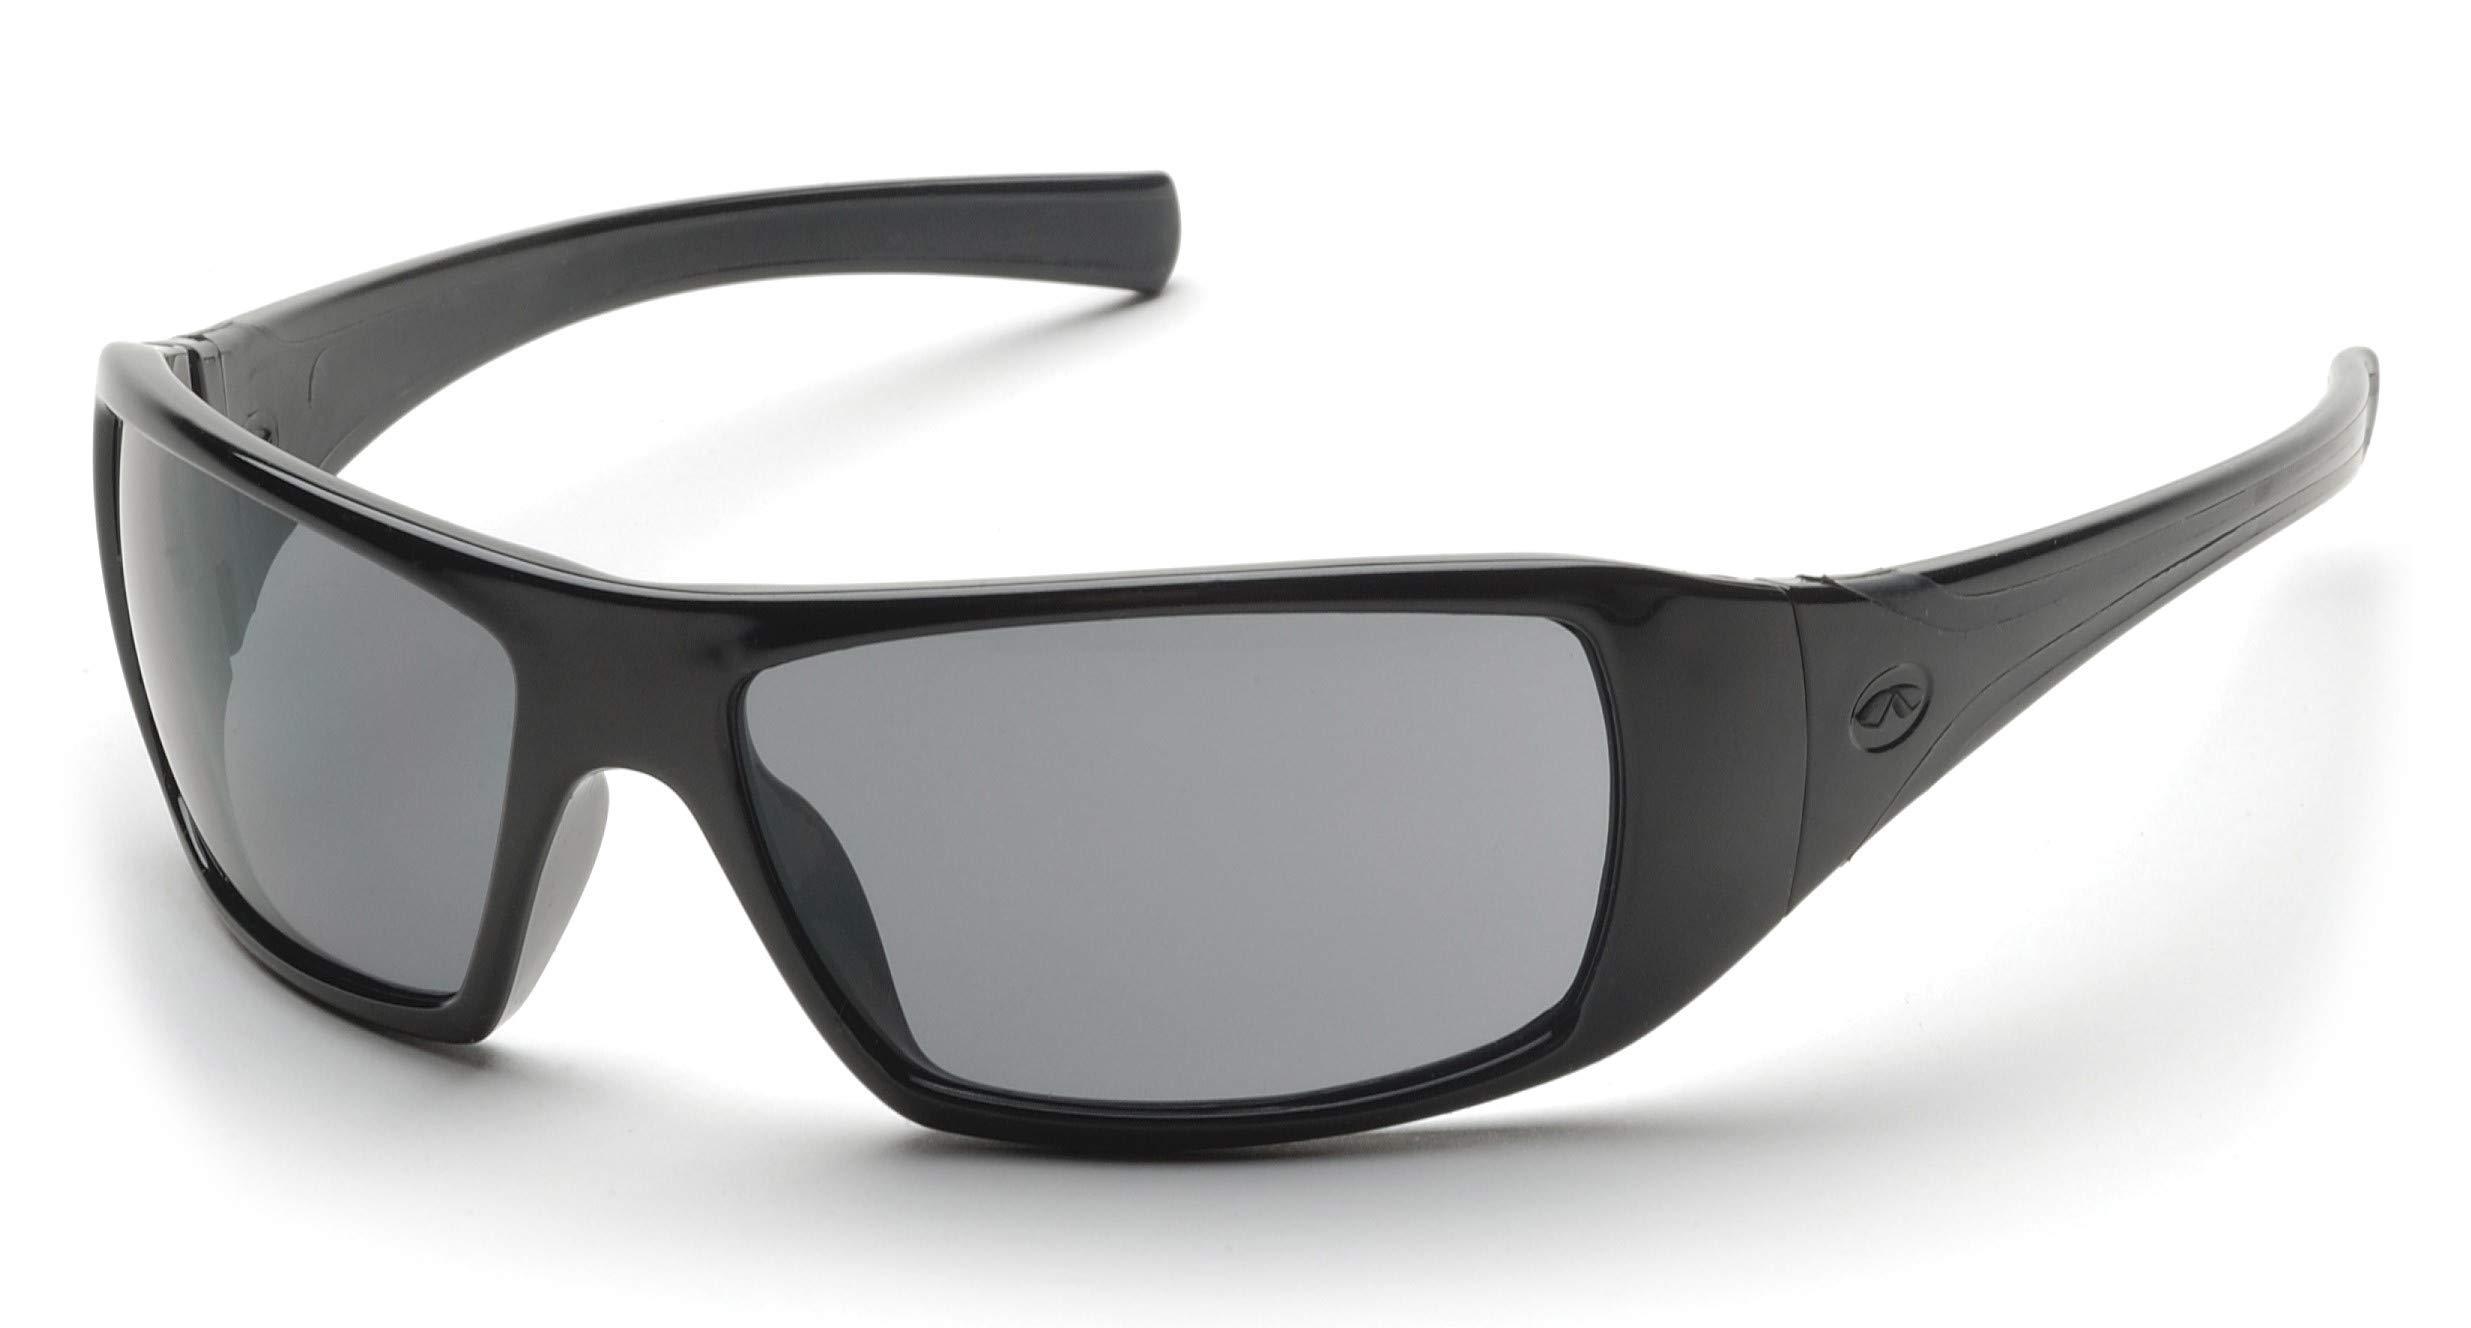 Pyramex Goliath Safety Eyewear, Black Frame, Gray Polarized Lens by Pyramex Safety